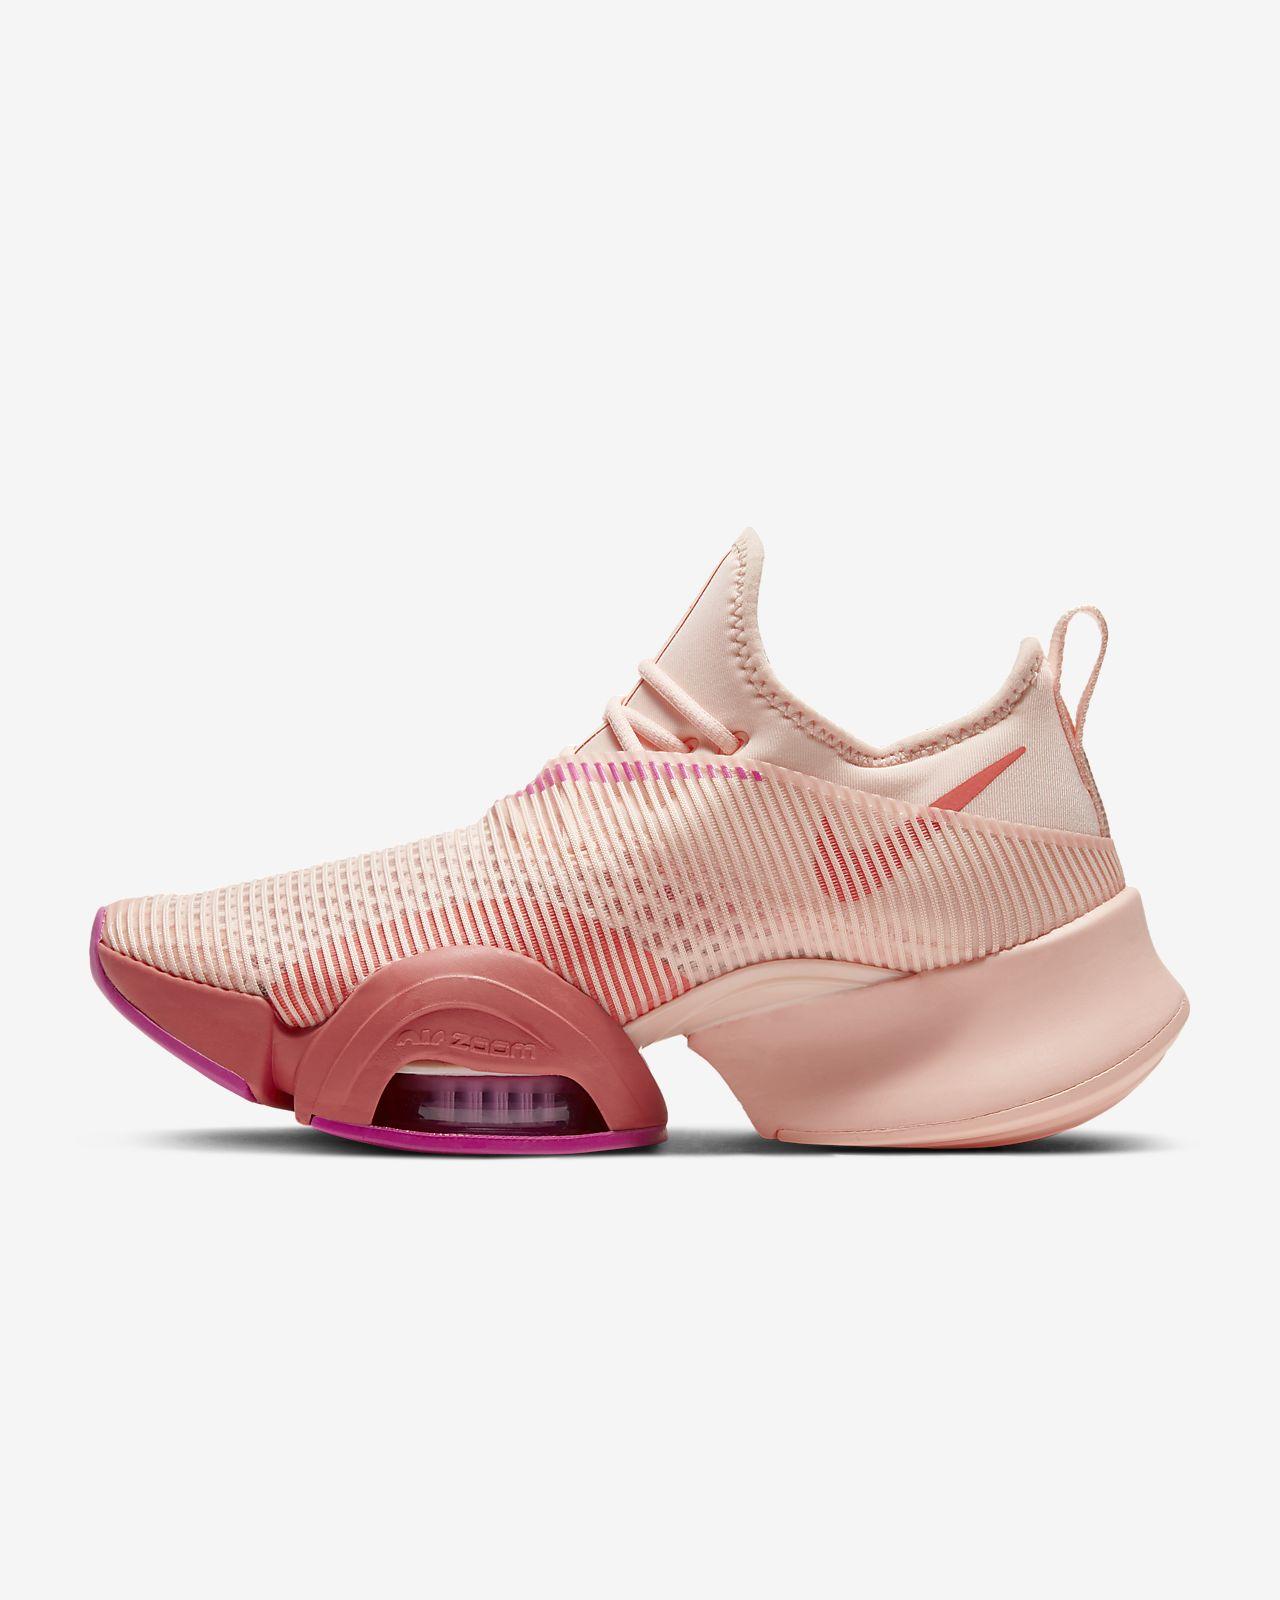 Nike Air Zoom SuperRep Damenschuhe für HIIT-Kurse